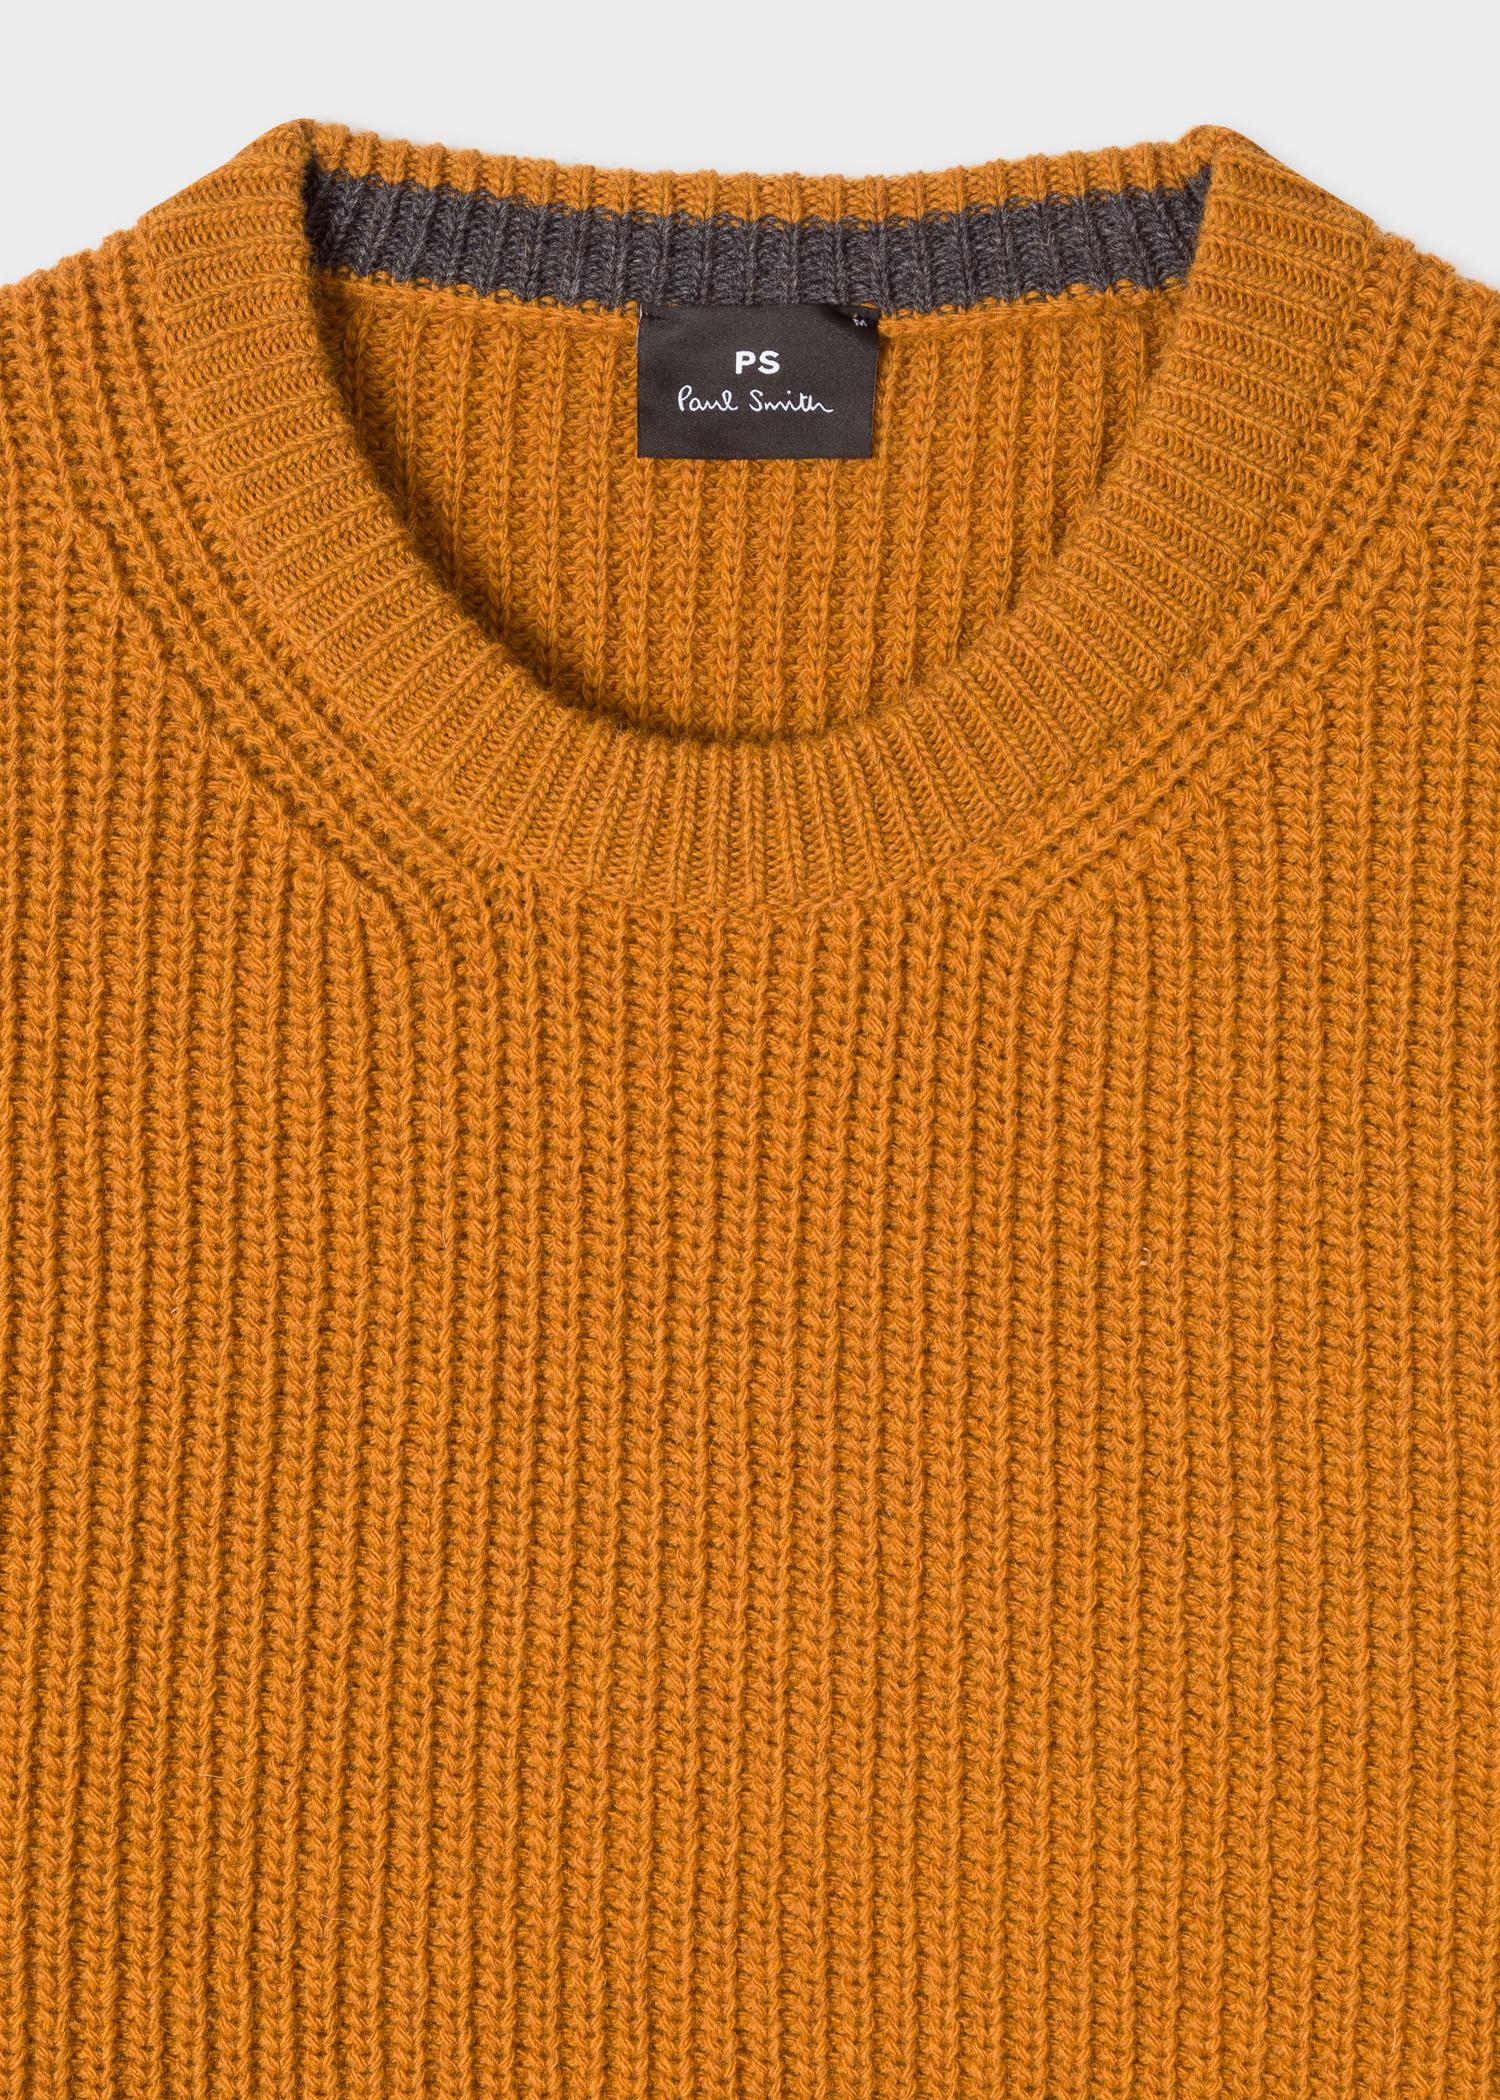 12284c63aa7900 Collar detail - Men's Mustard Ribbed Wool-Blend Sweater Paul Smith